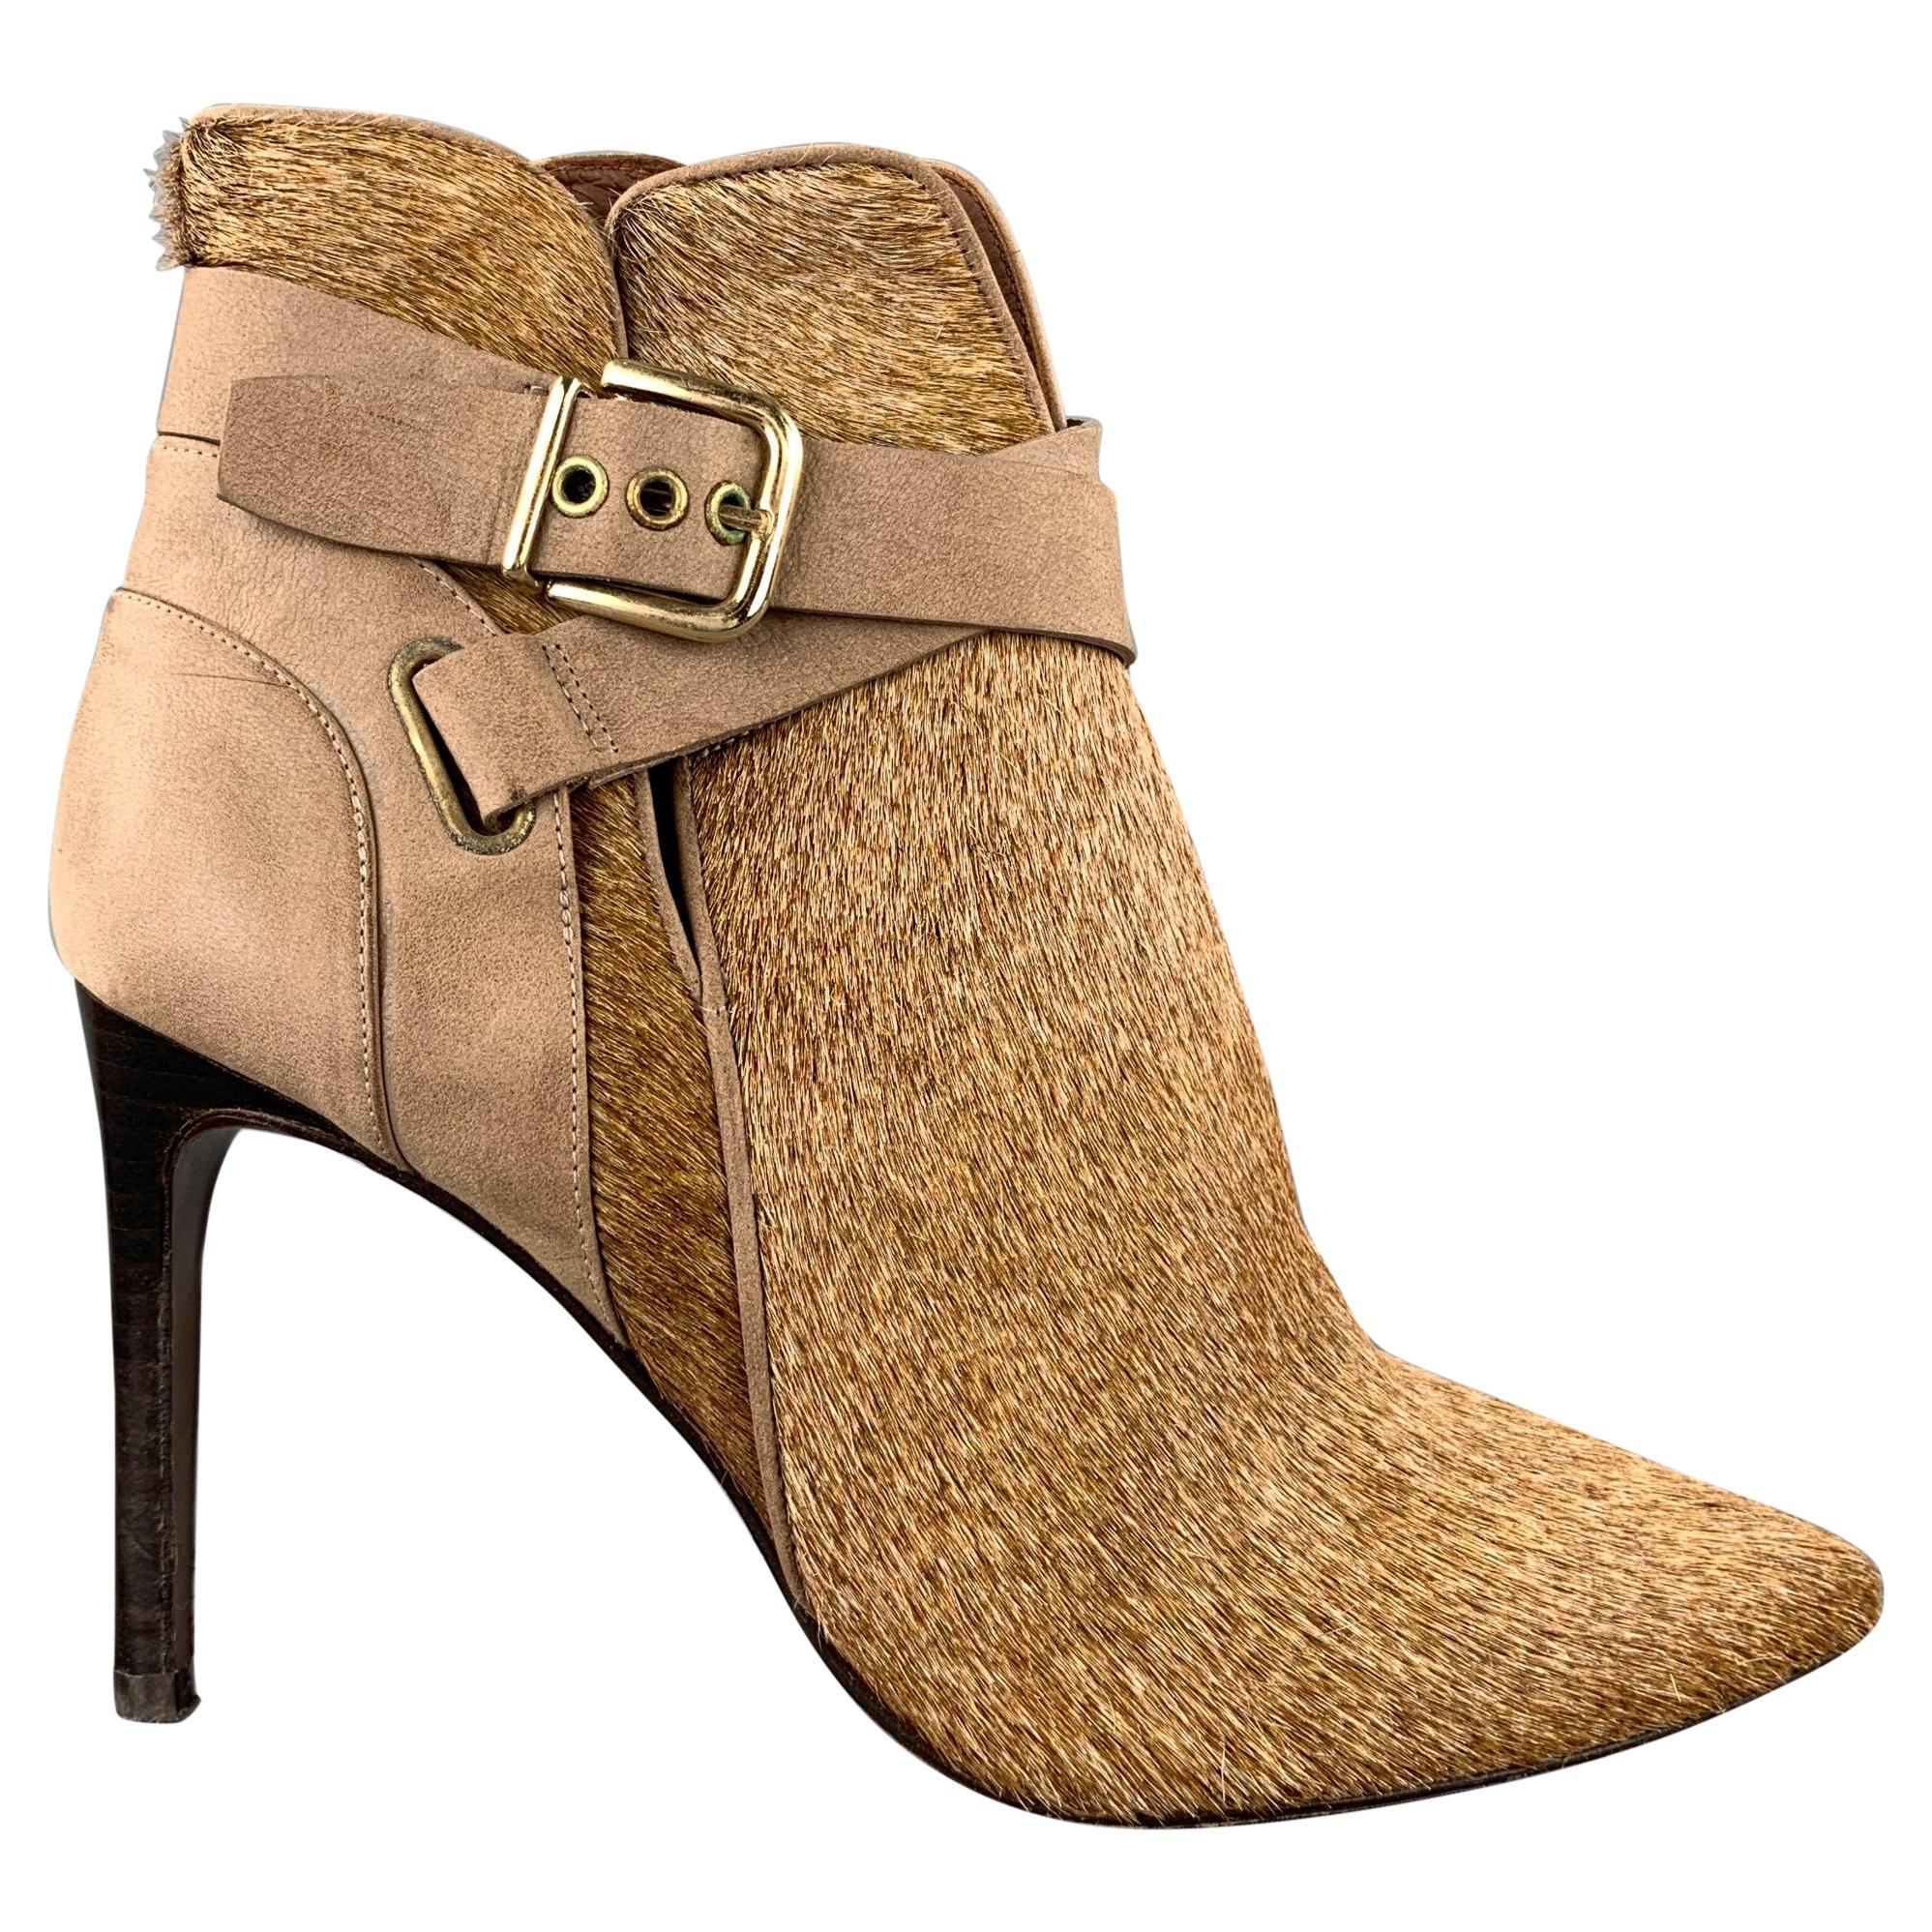 DONALD J PLINER Size 7 Tan Leather Ankle Boots